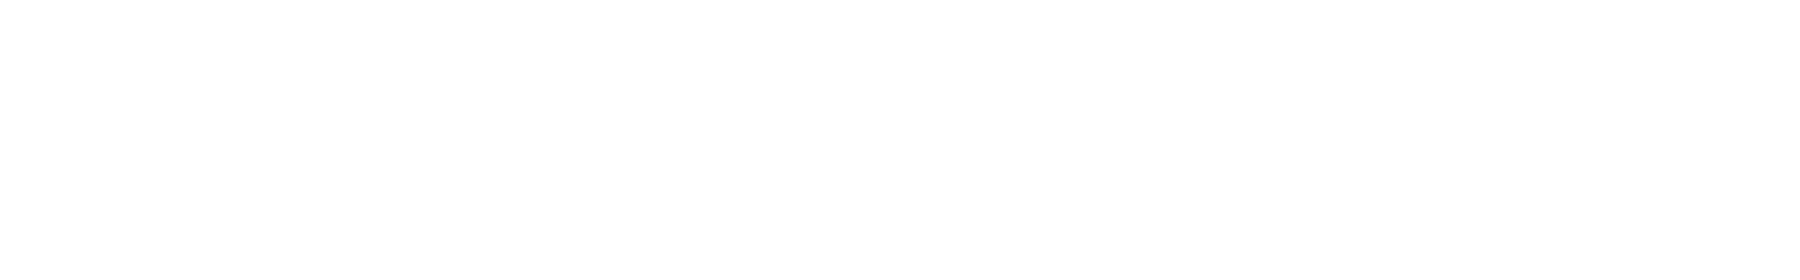 93 f jazzdoublebass sp